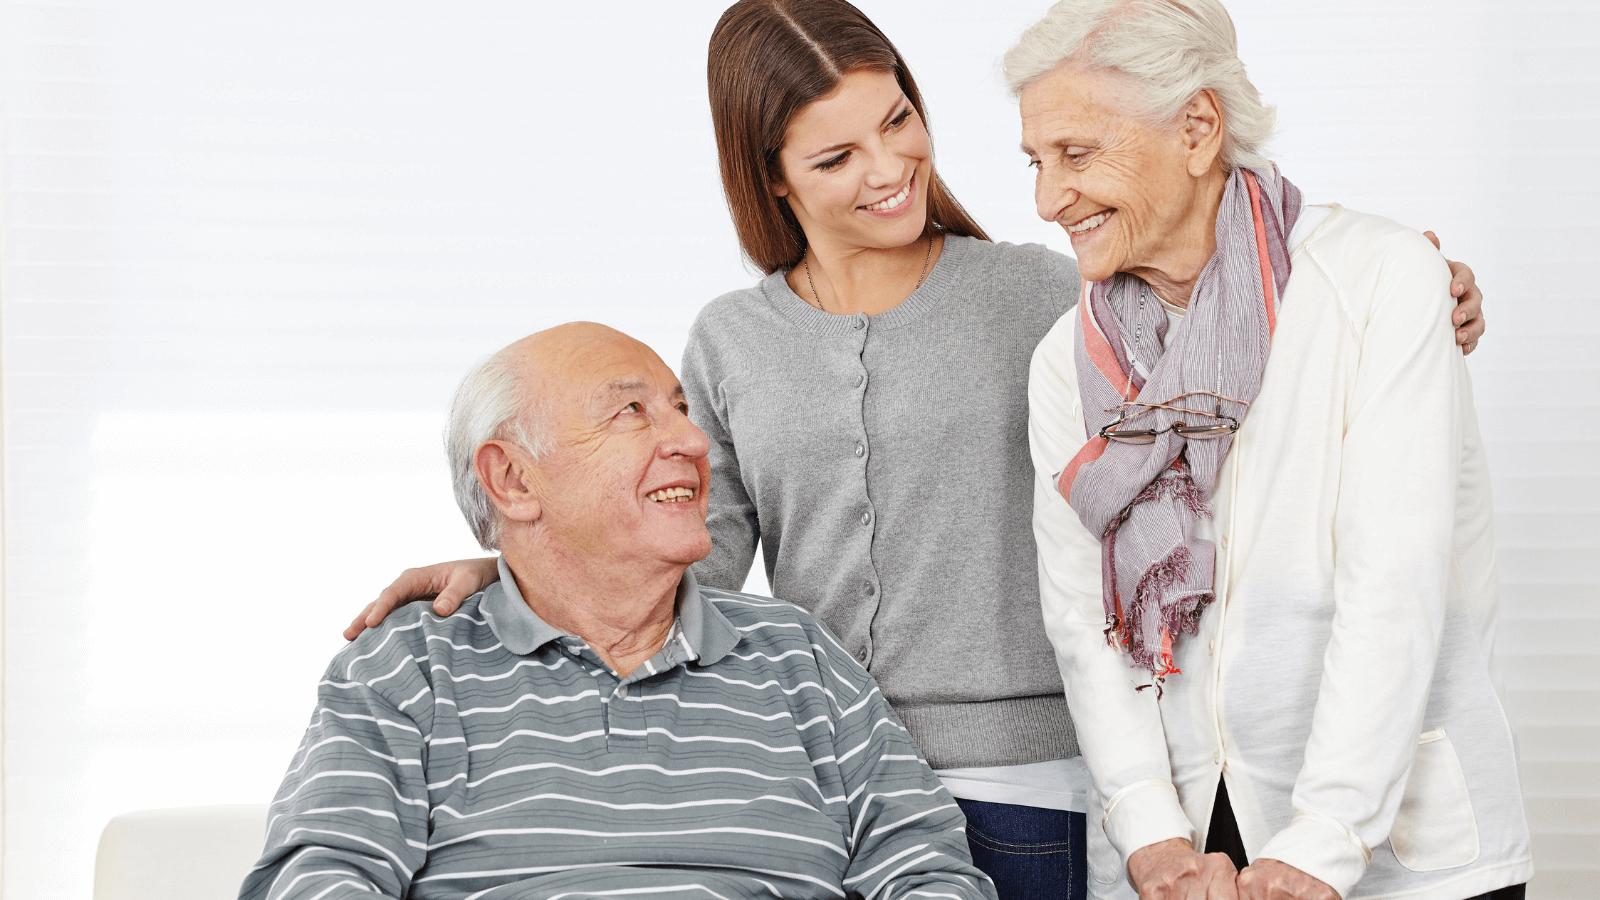 Senhora a cuidar de casal idoso